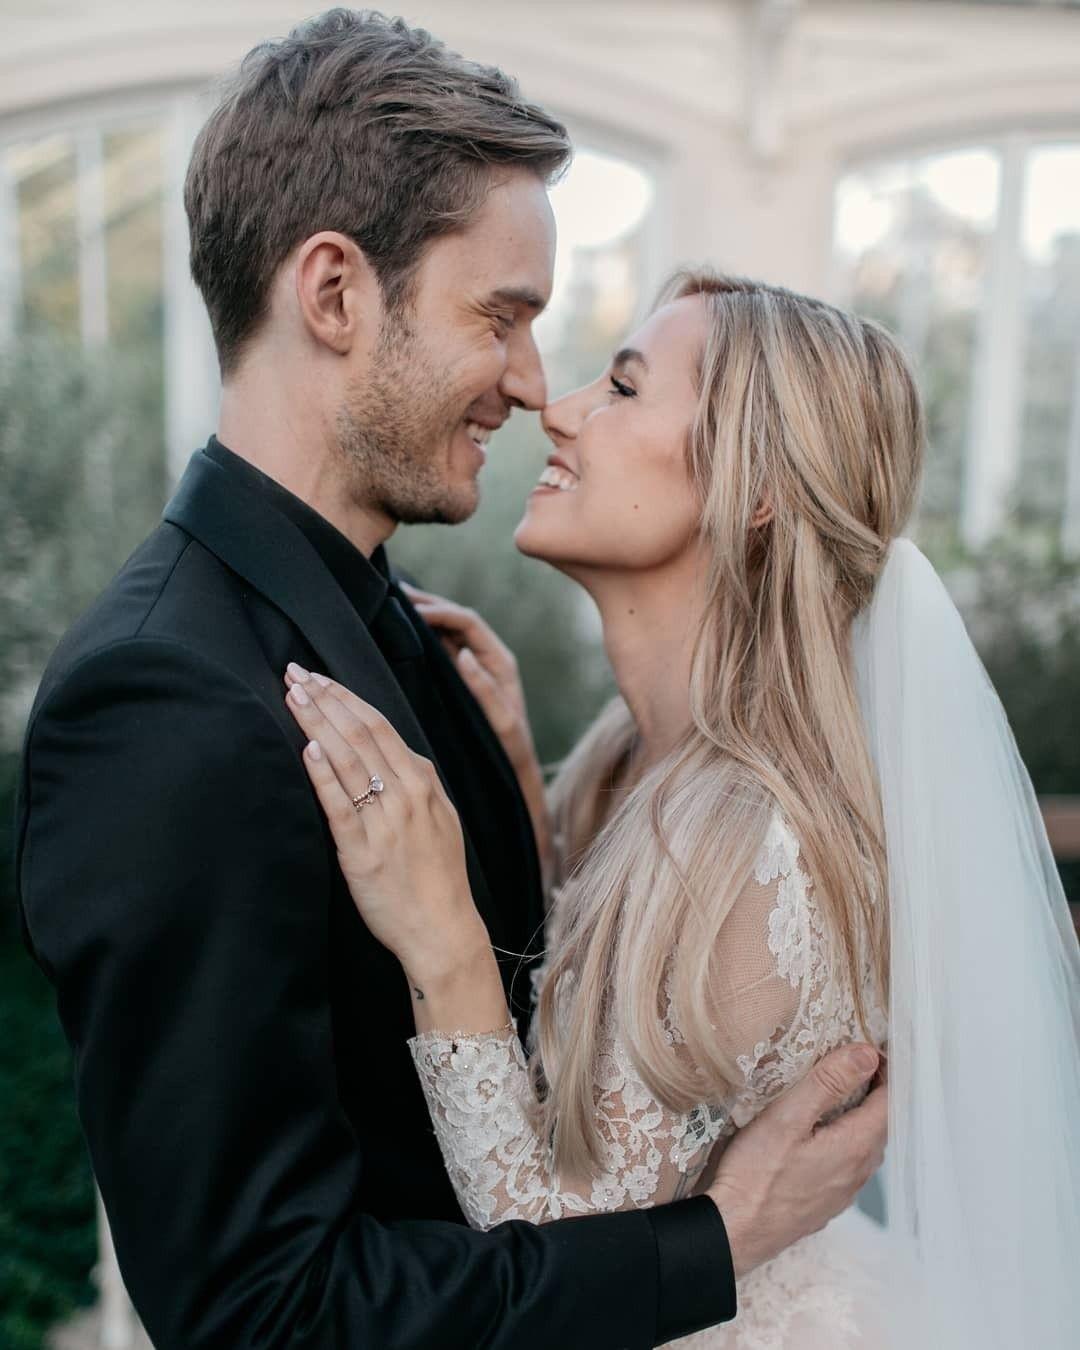 August 19, 2019: Marzia Bisognin and Felix Kjellberg got ...